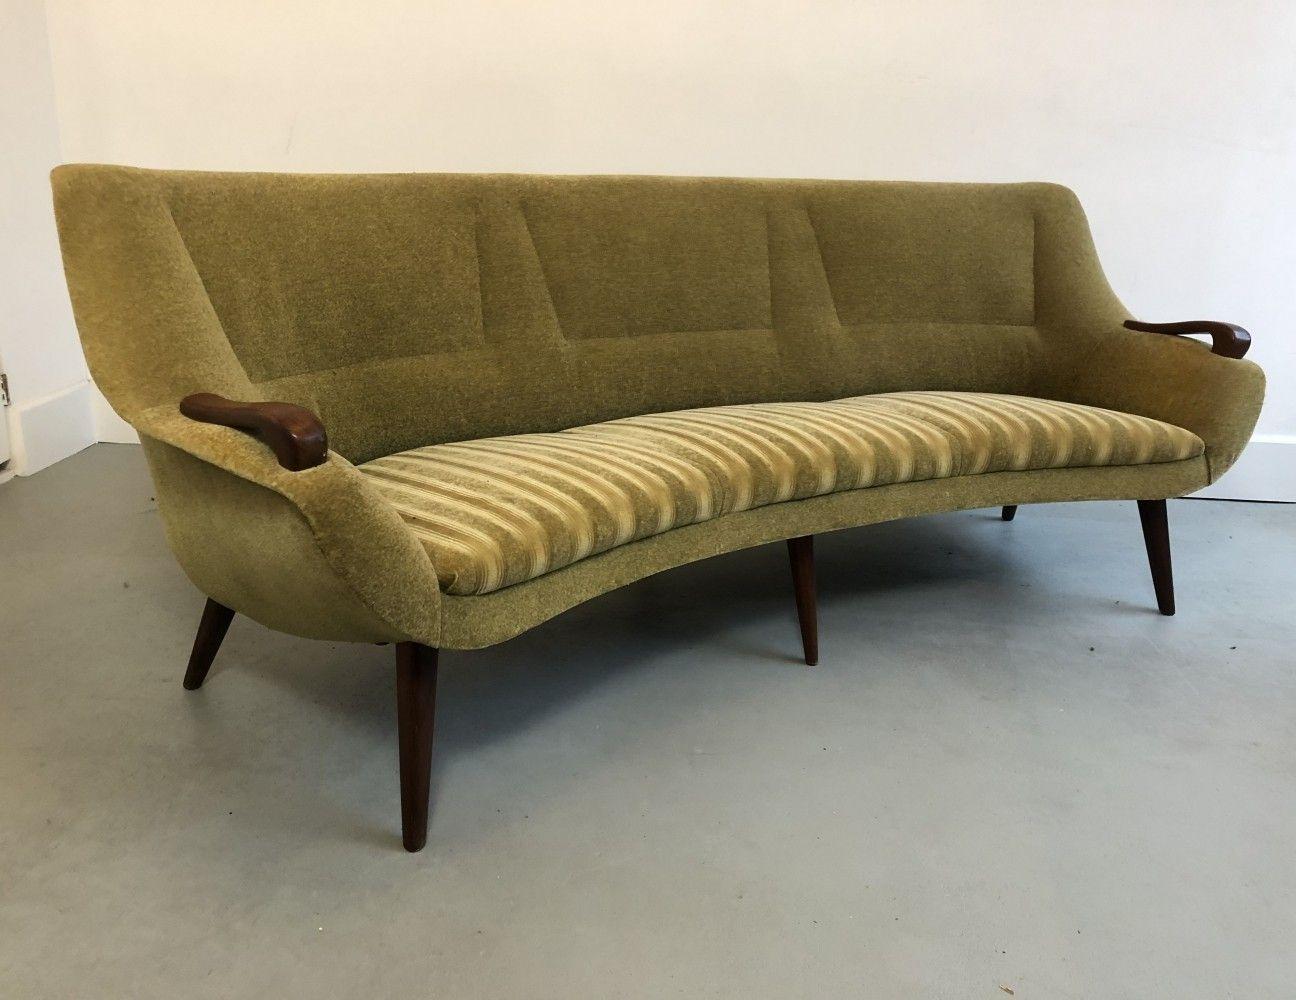 Marvelous For Sale Vintage Sofa 1950S Furniture In 2019 Vintage Machost Co Dining Chair Design Ideas Machostcouk